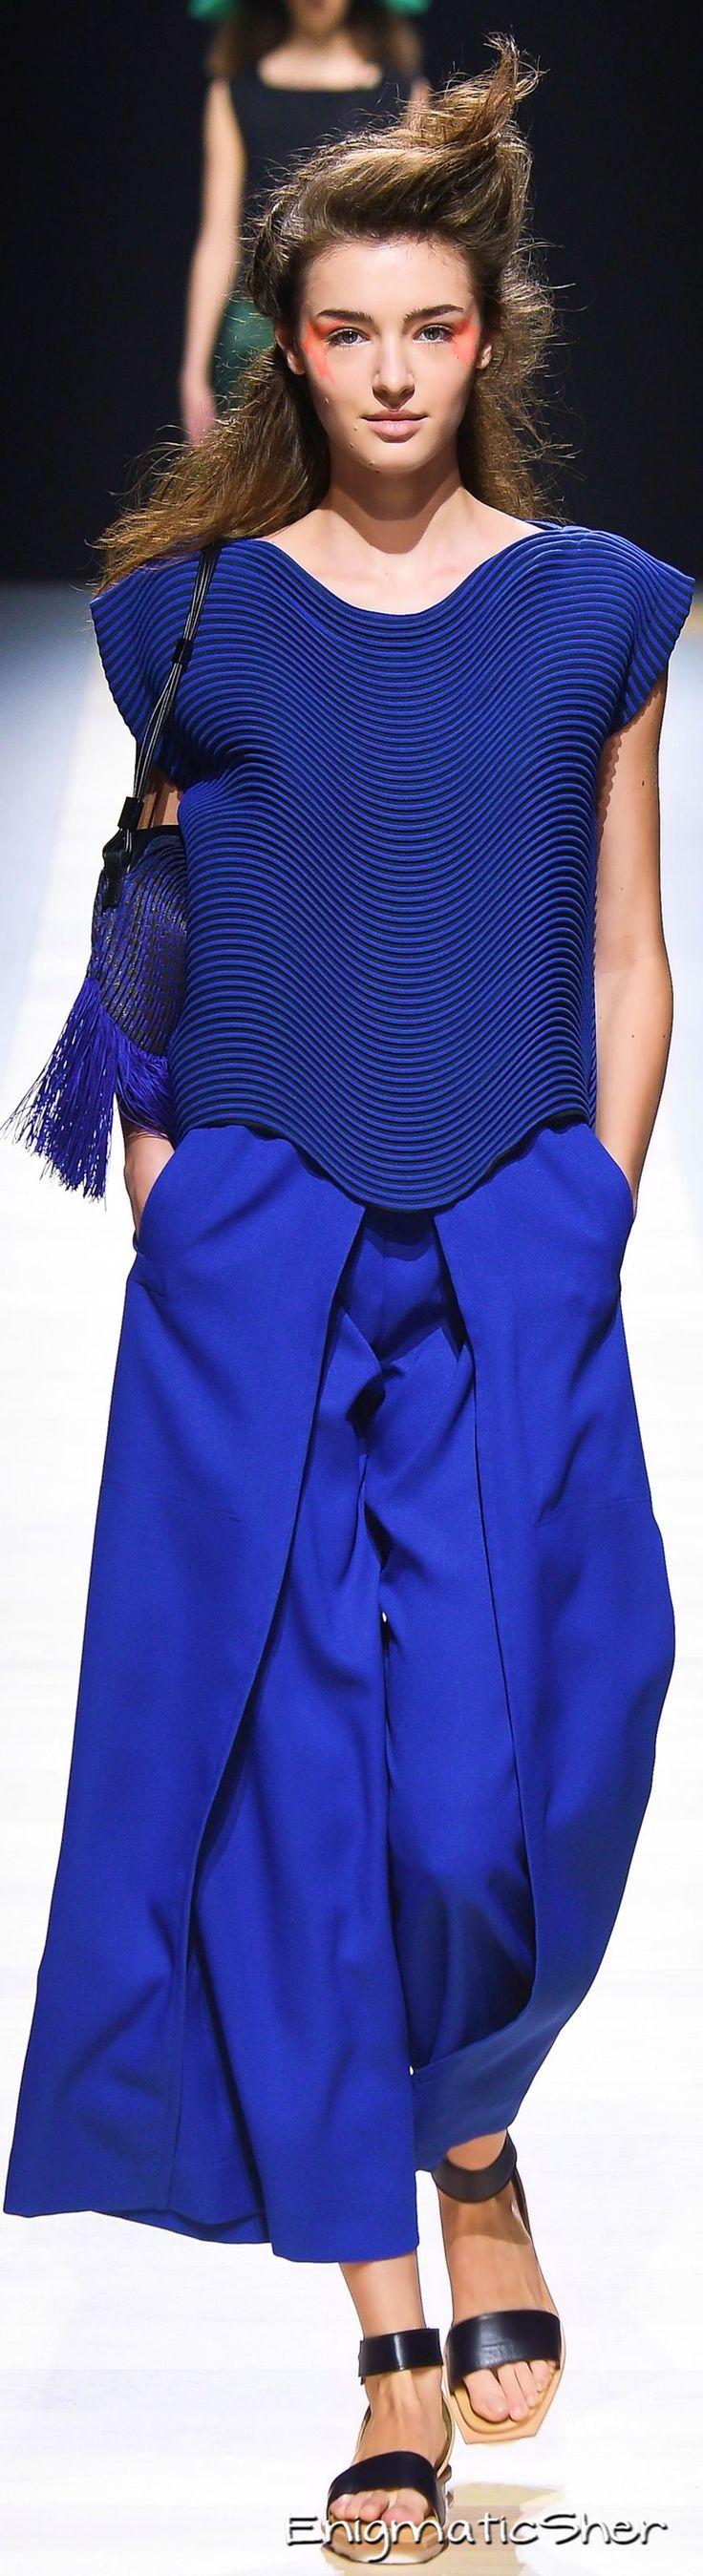 Issey Miyake Spring 2016 Ready-to-Wear